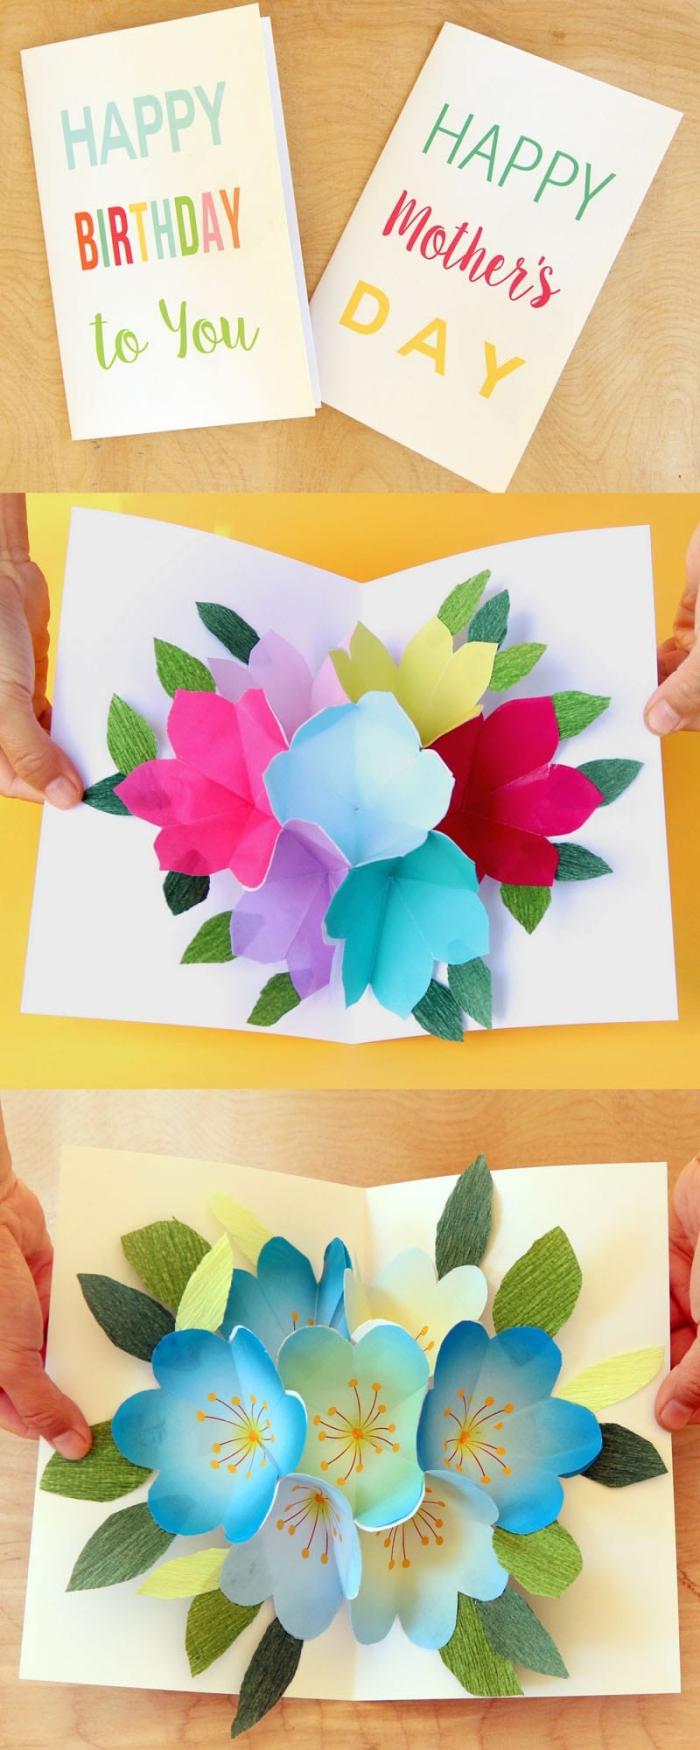 pop up karte basteln, geburtstagskarten gestalten, bunte blumen, 3d blüten